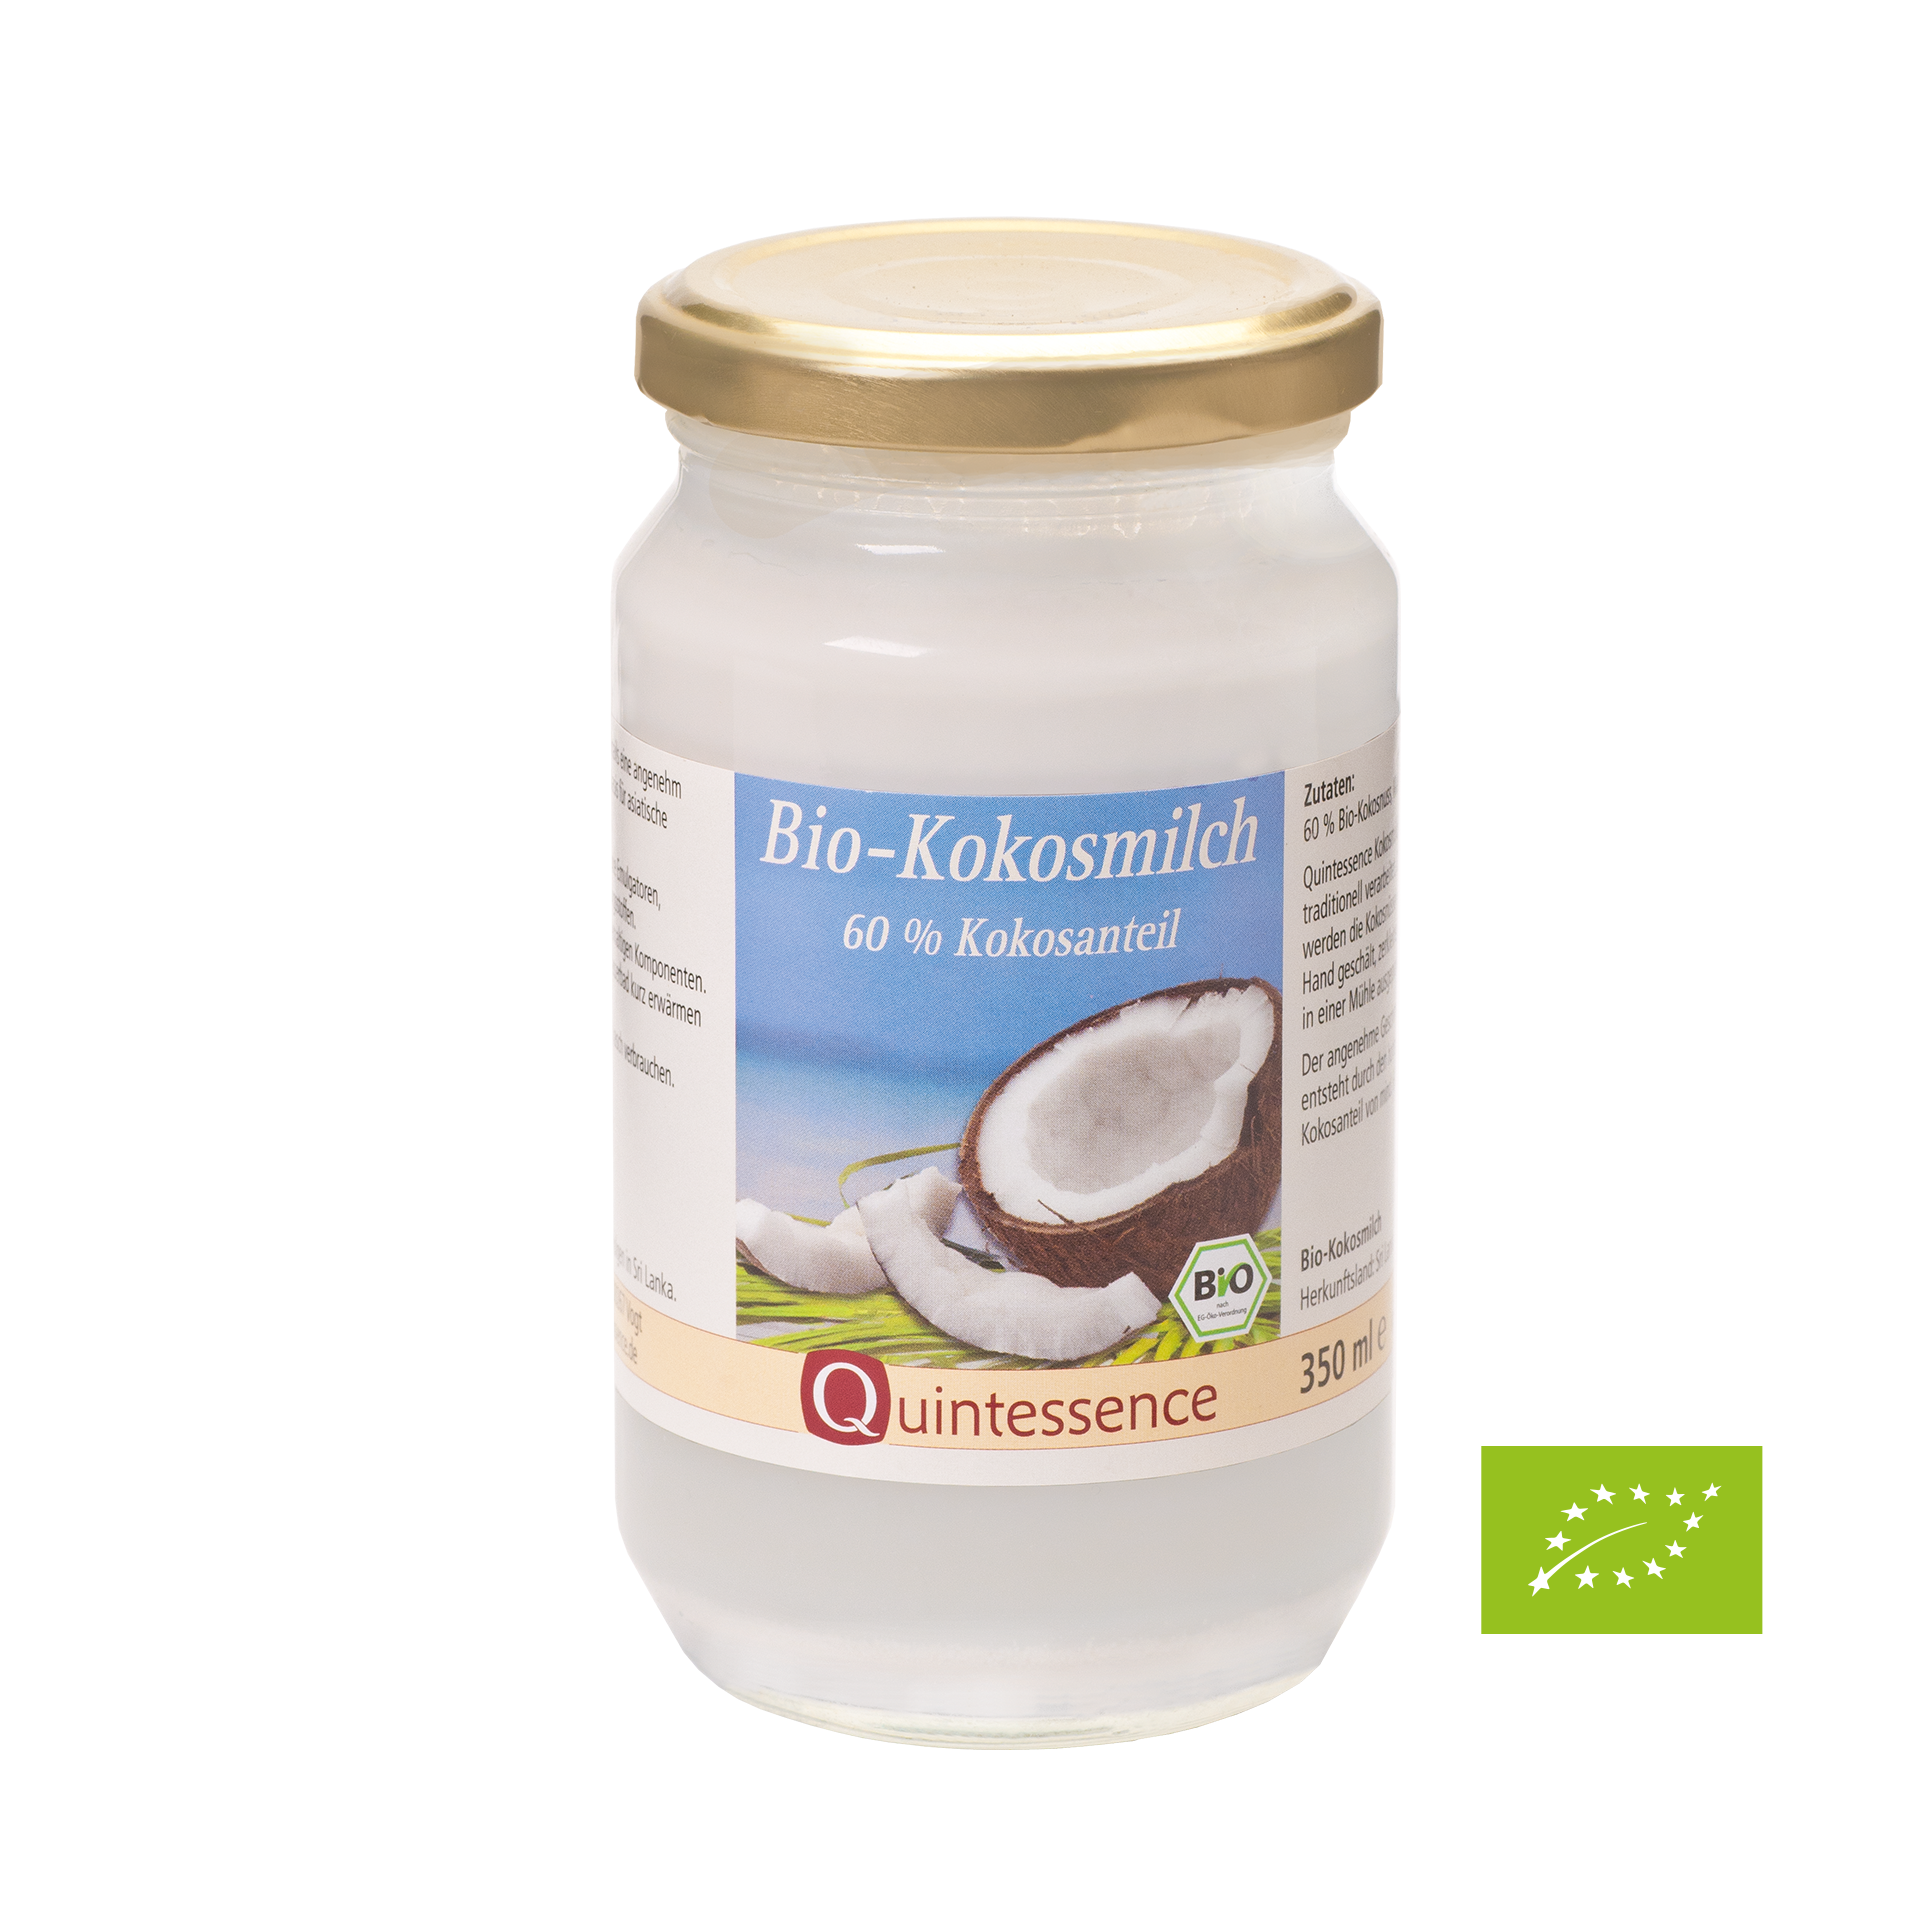 BIO-Kokosmilch, Quintessence, 350 ml - im Glas